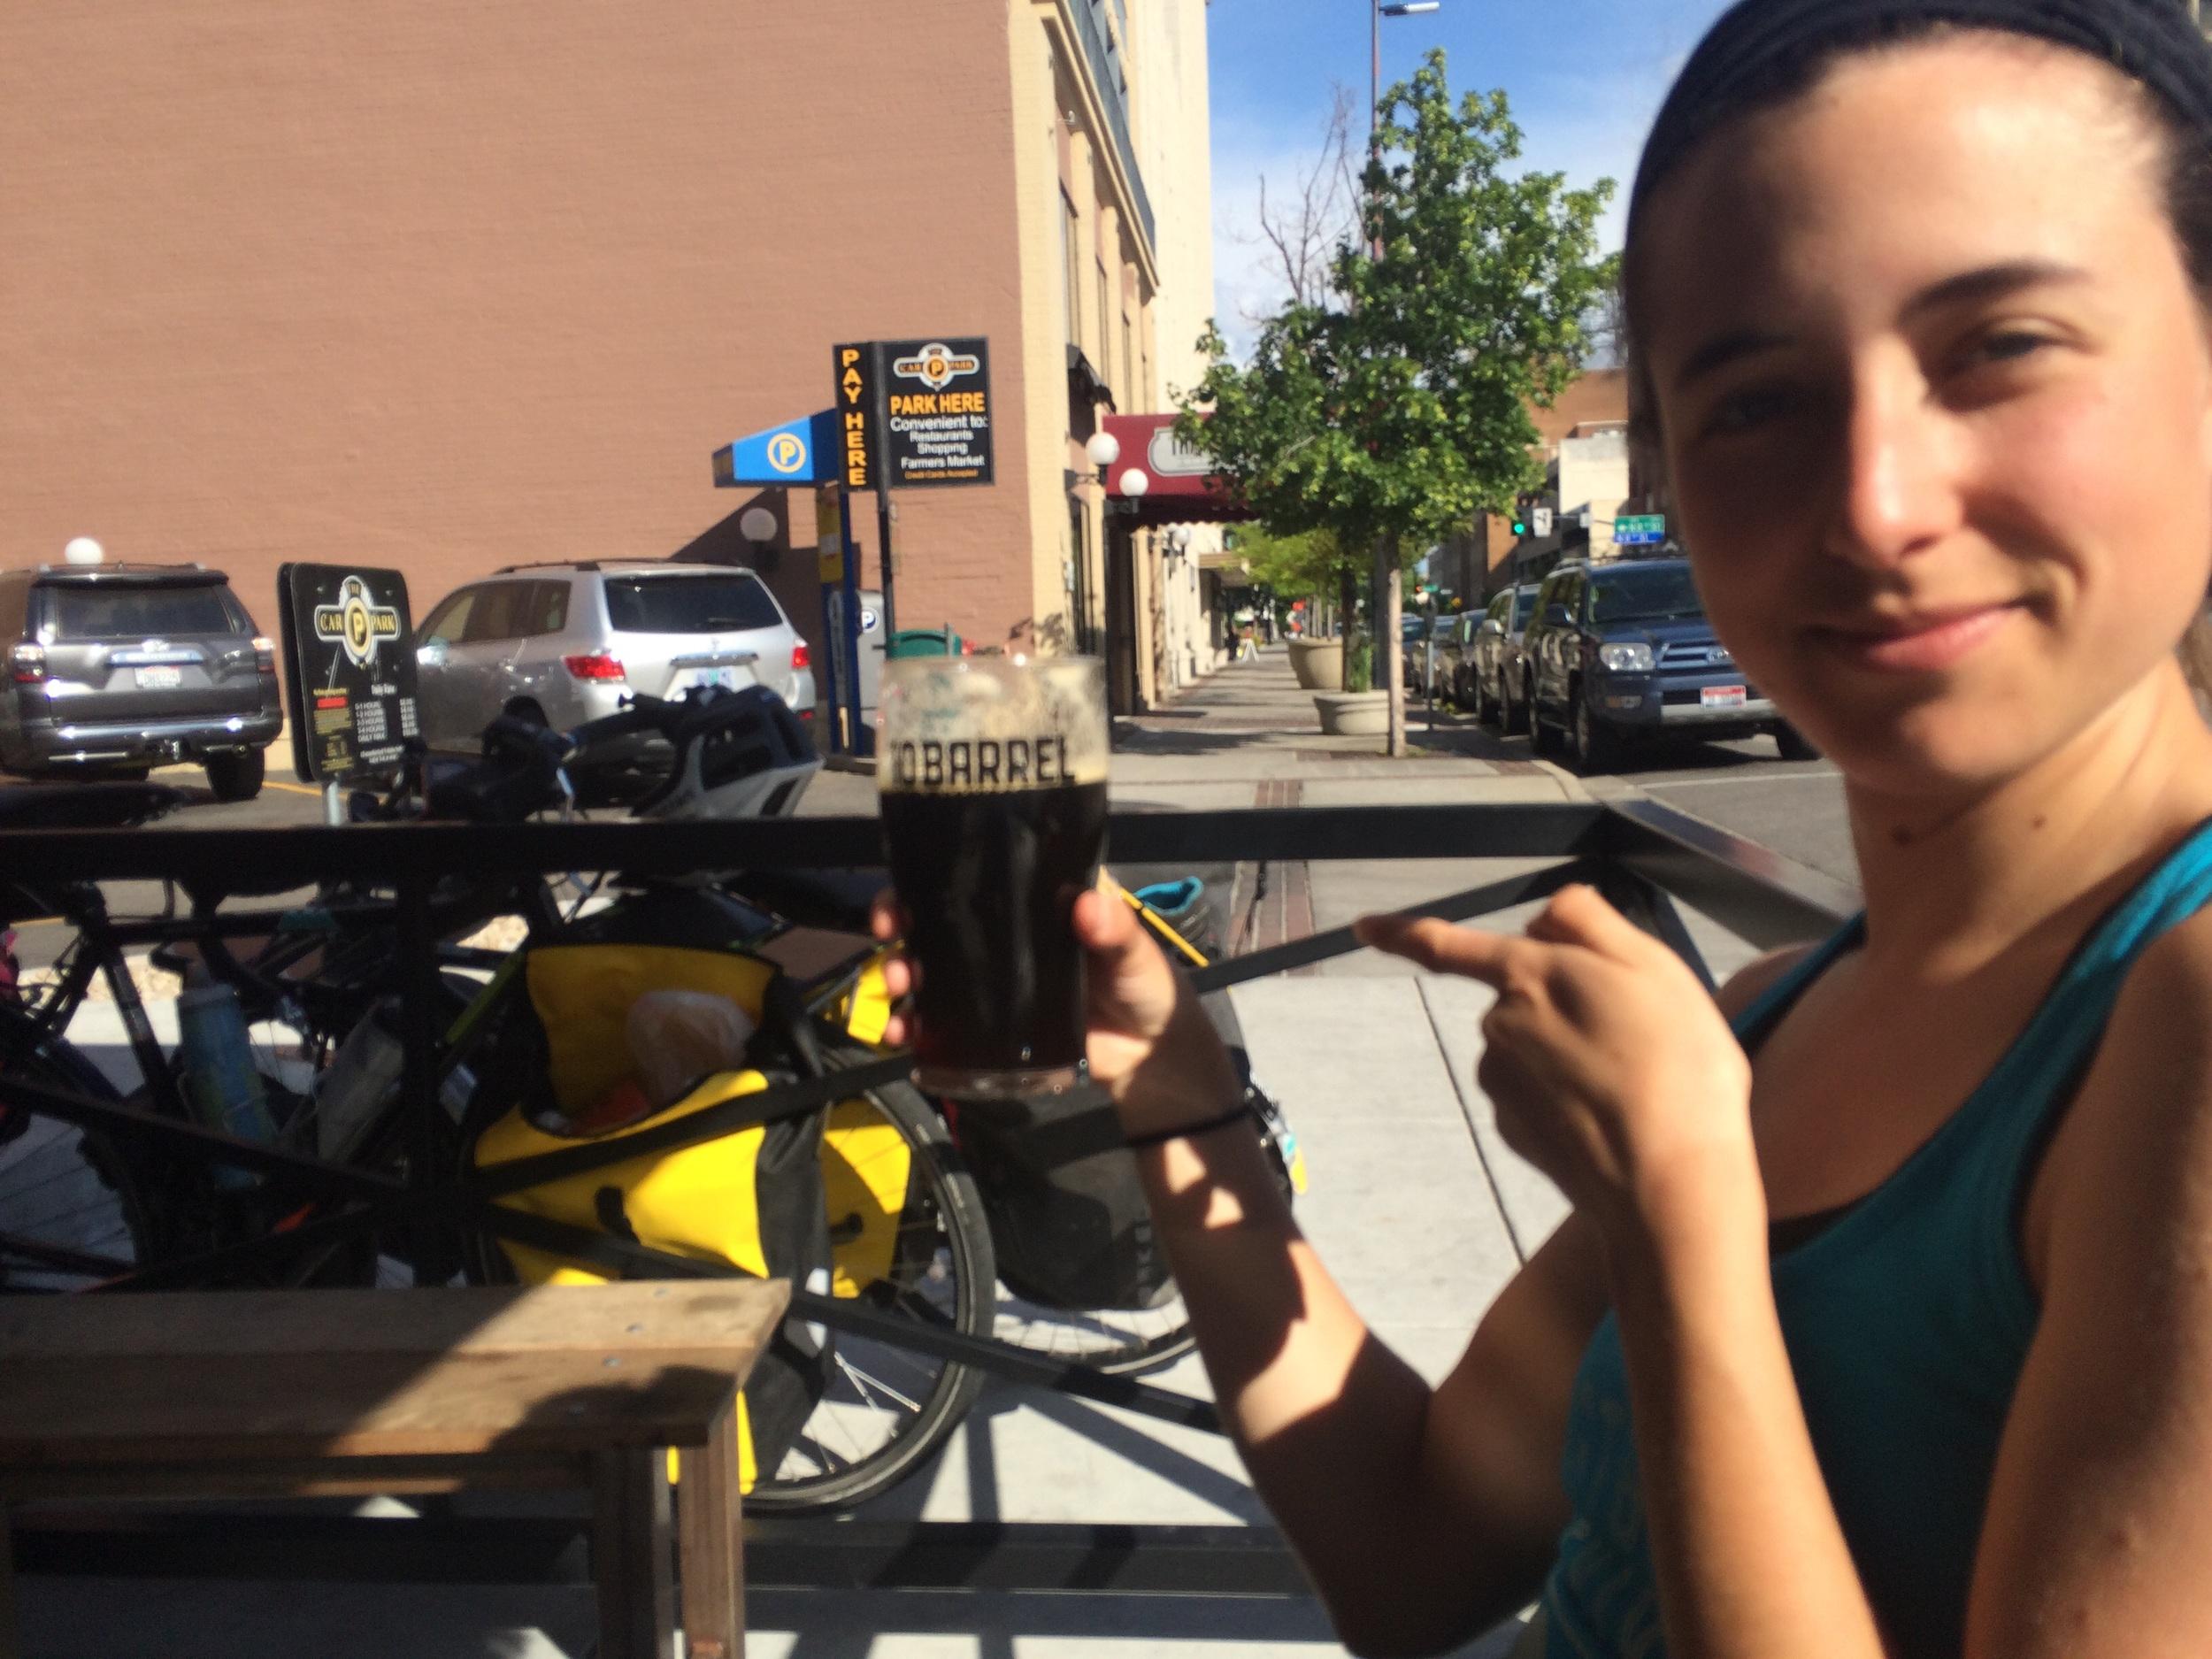 Rachel drinks a pint of their darkest; we're all shocked